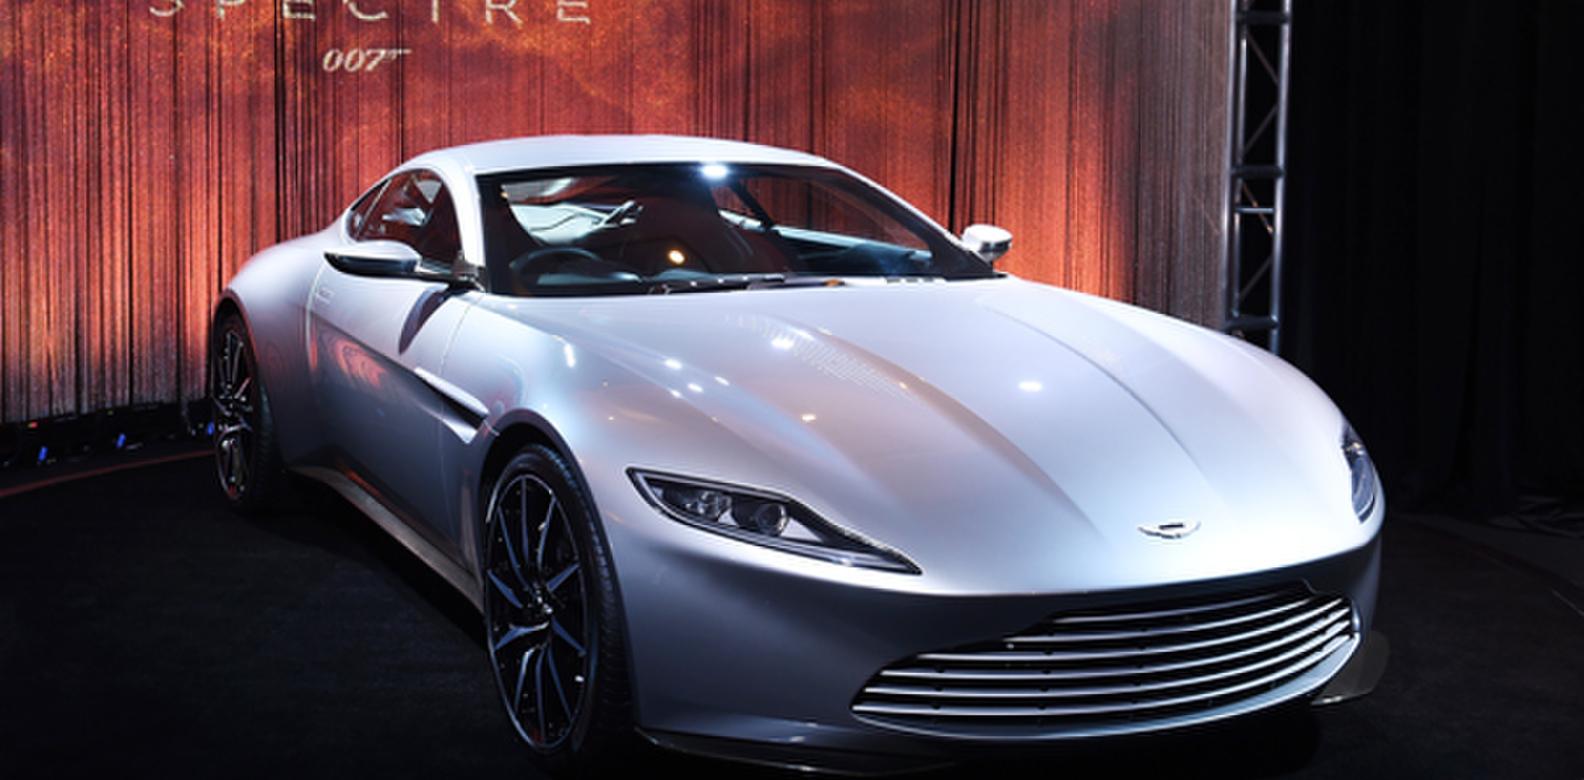 Take Home S Latest Ride The Aston Martin DB Singapore Tatler - Aston martin db 10